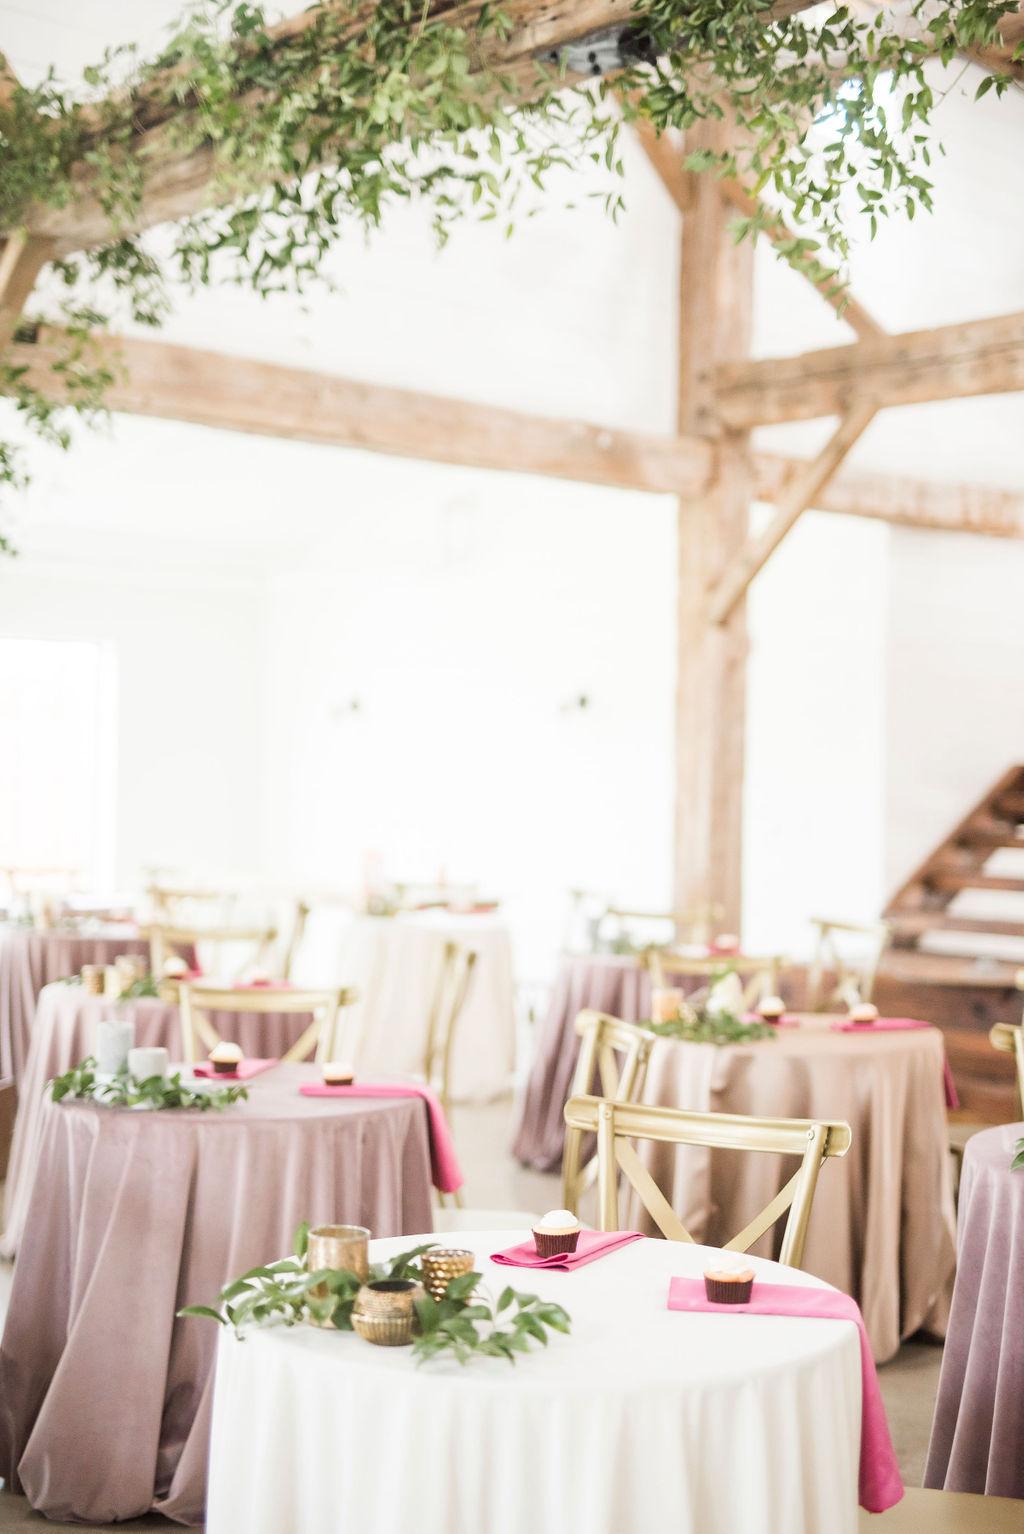 VELVET LINENS WEDDING INSPIRATION THE MEEKERMARK HOUSTON WEDDING VENUE PLANNER DESIGNER EPOCH CO+ DESTINATION WEDDINGS